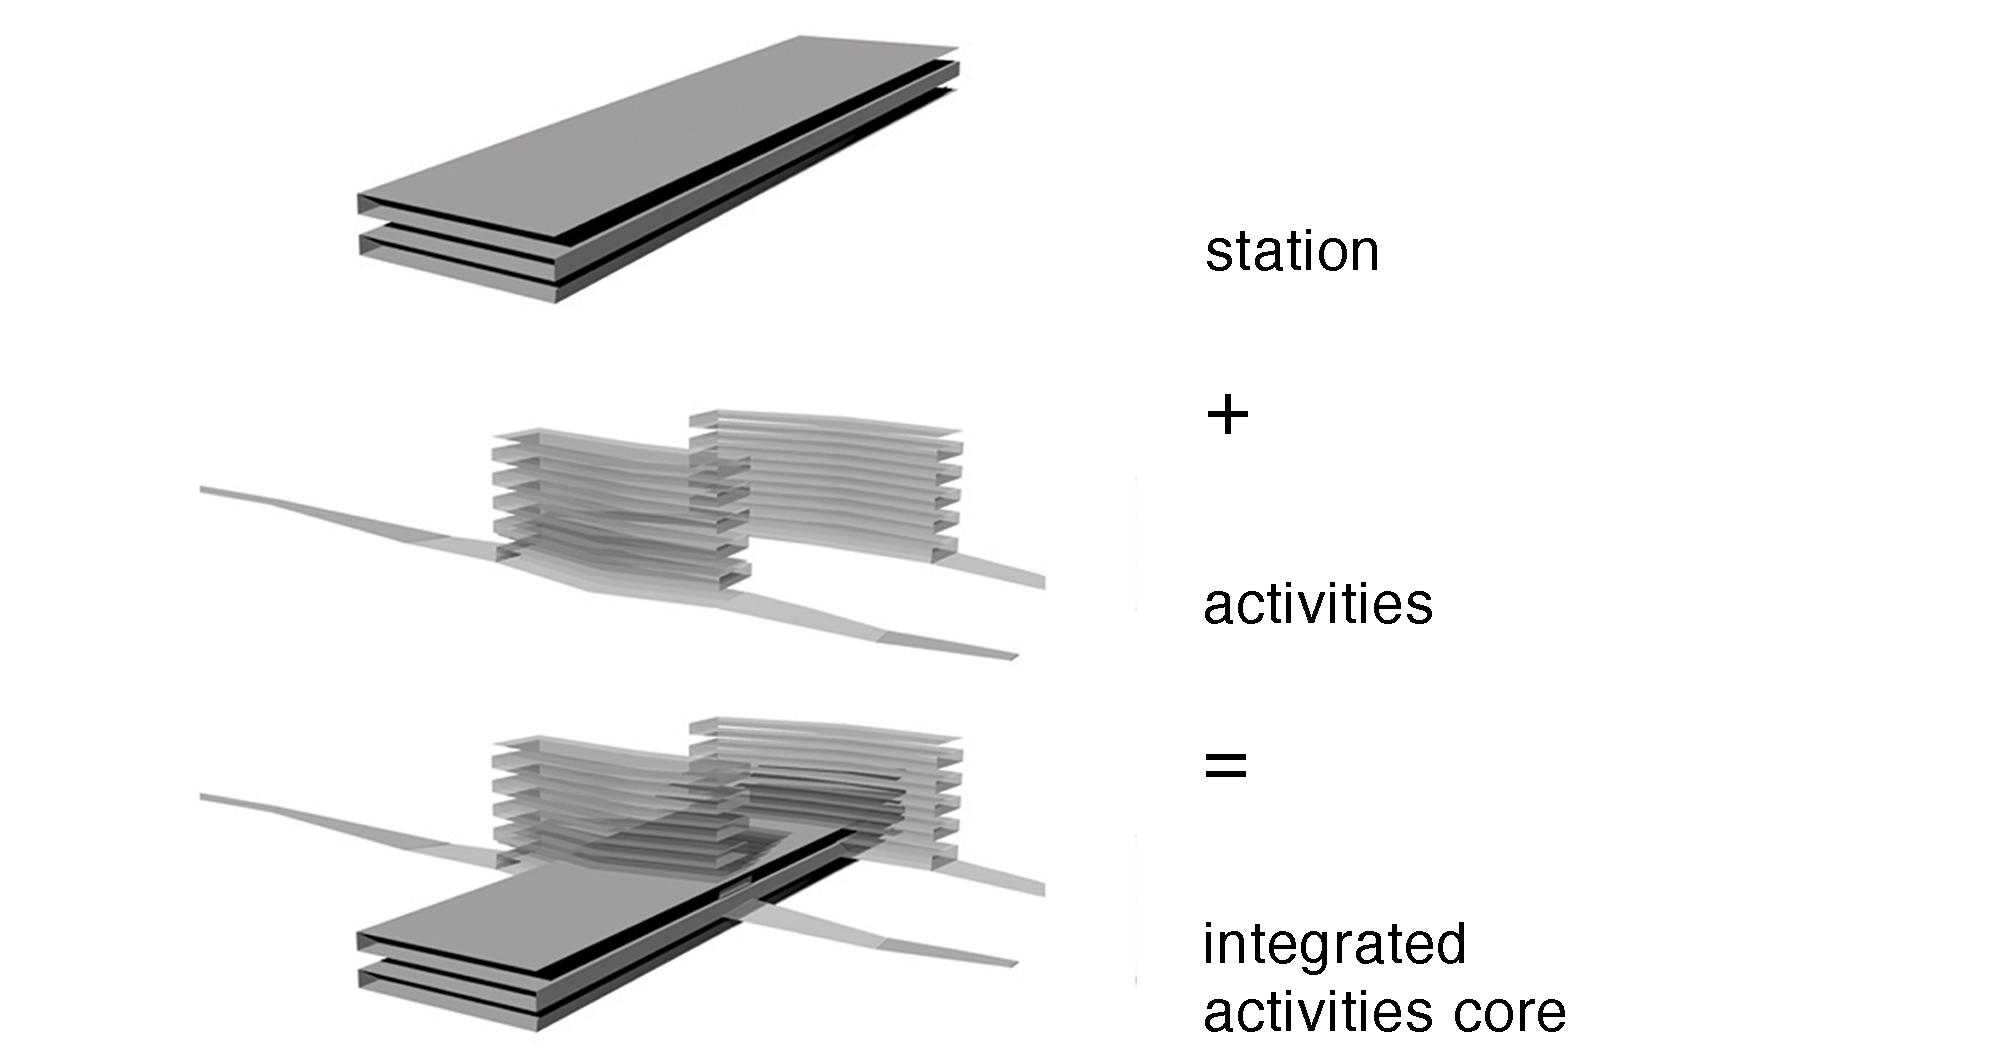 Bovisa integrated activities core